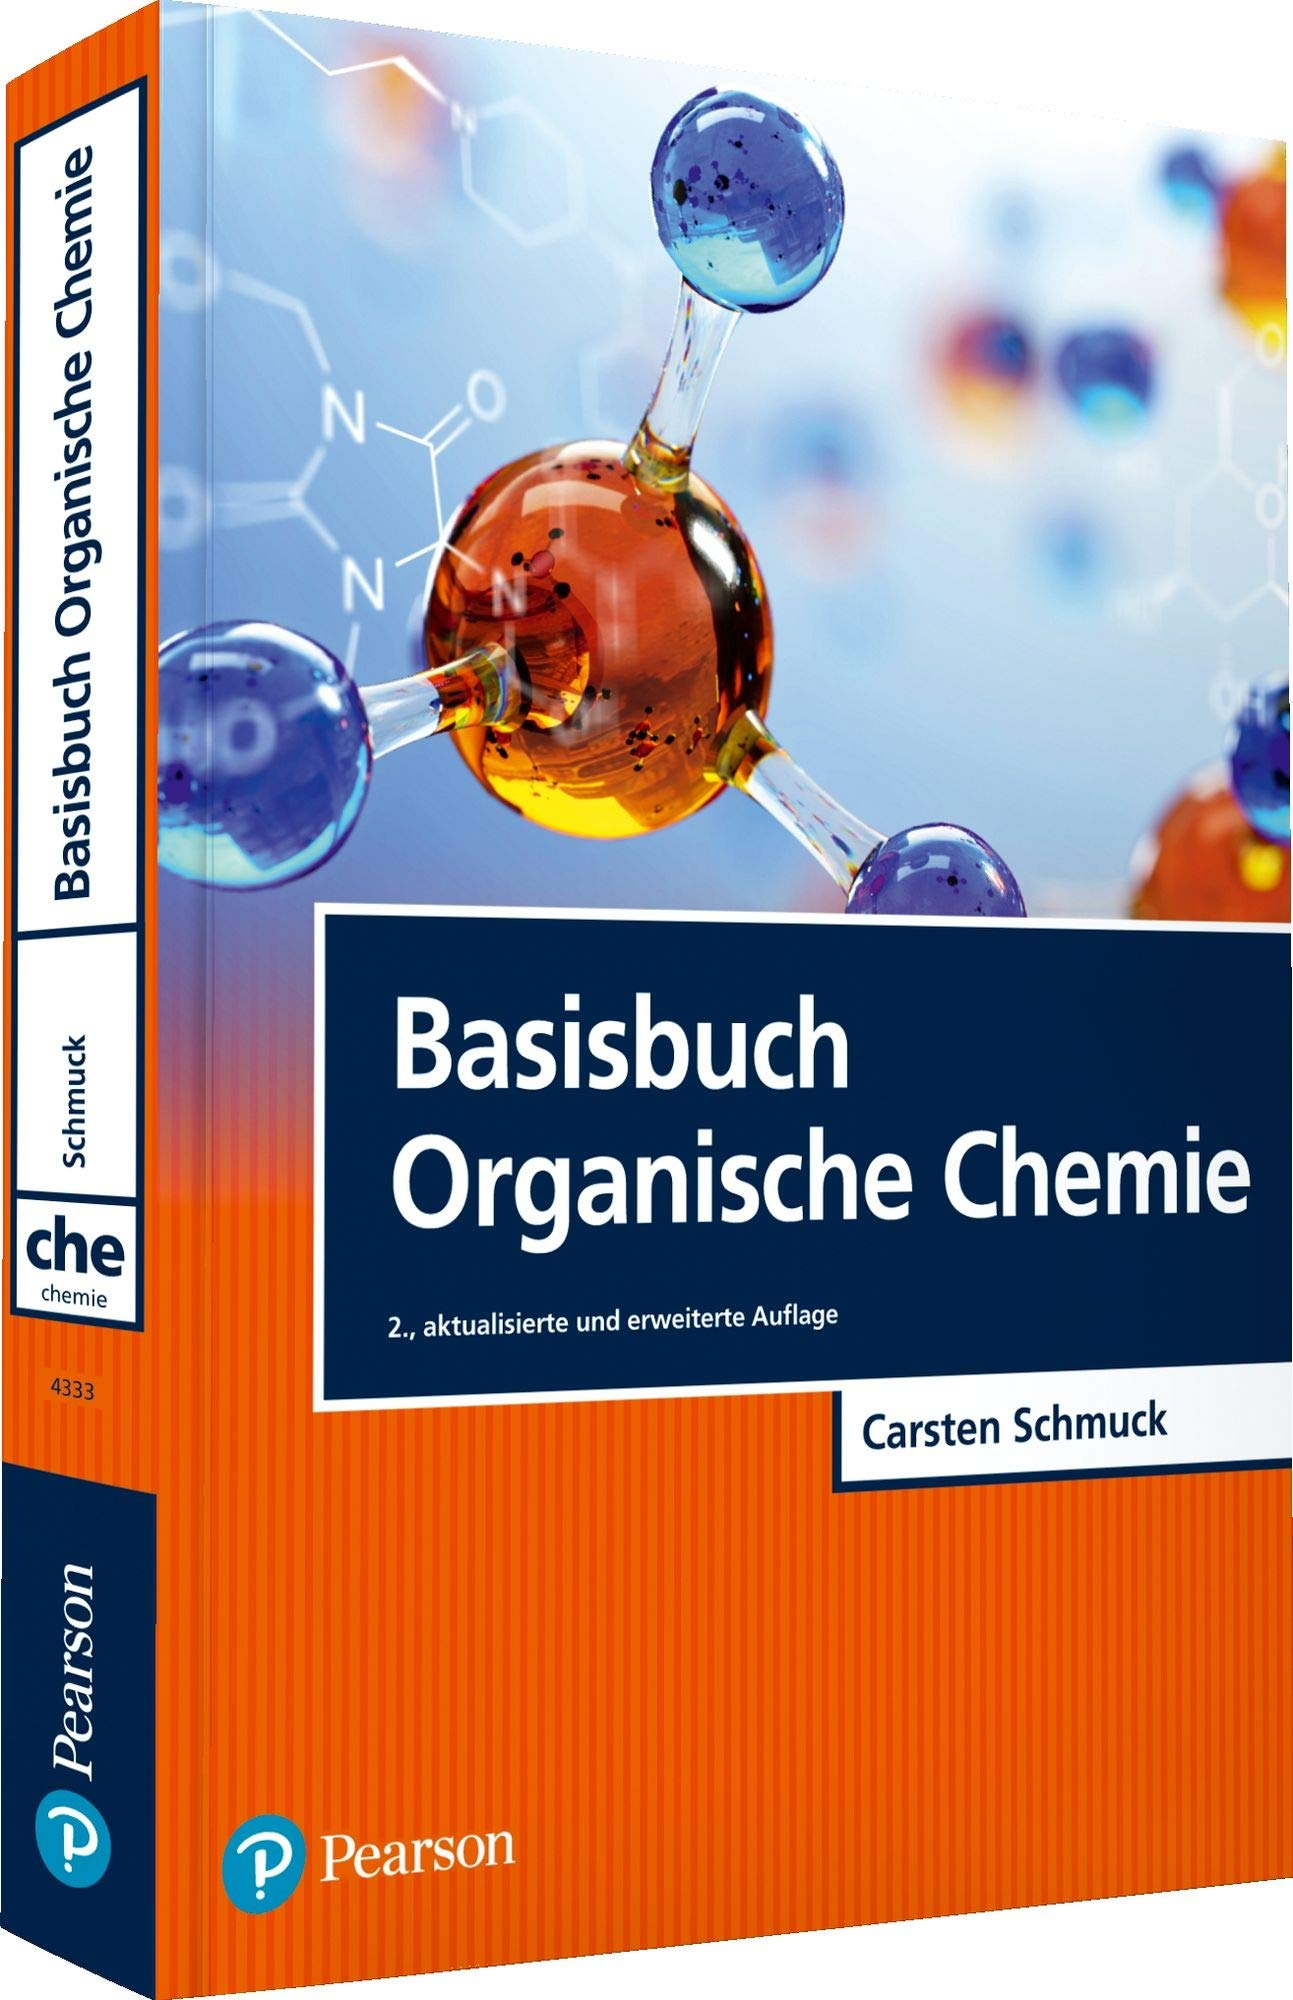 Basisbuch Organische Chemie  Pearson Studium   Chemie